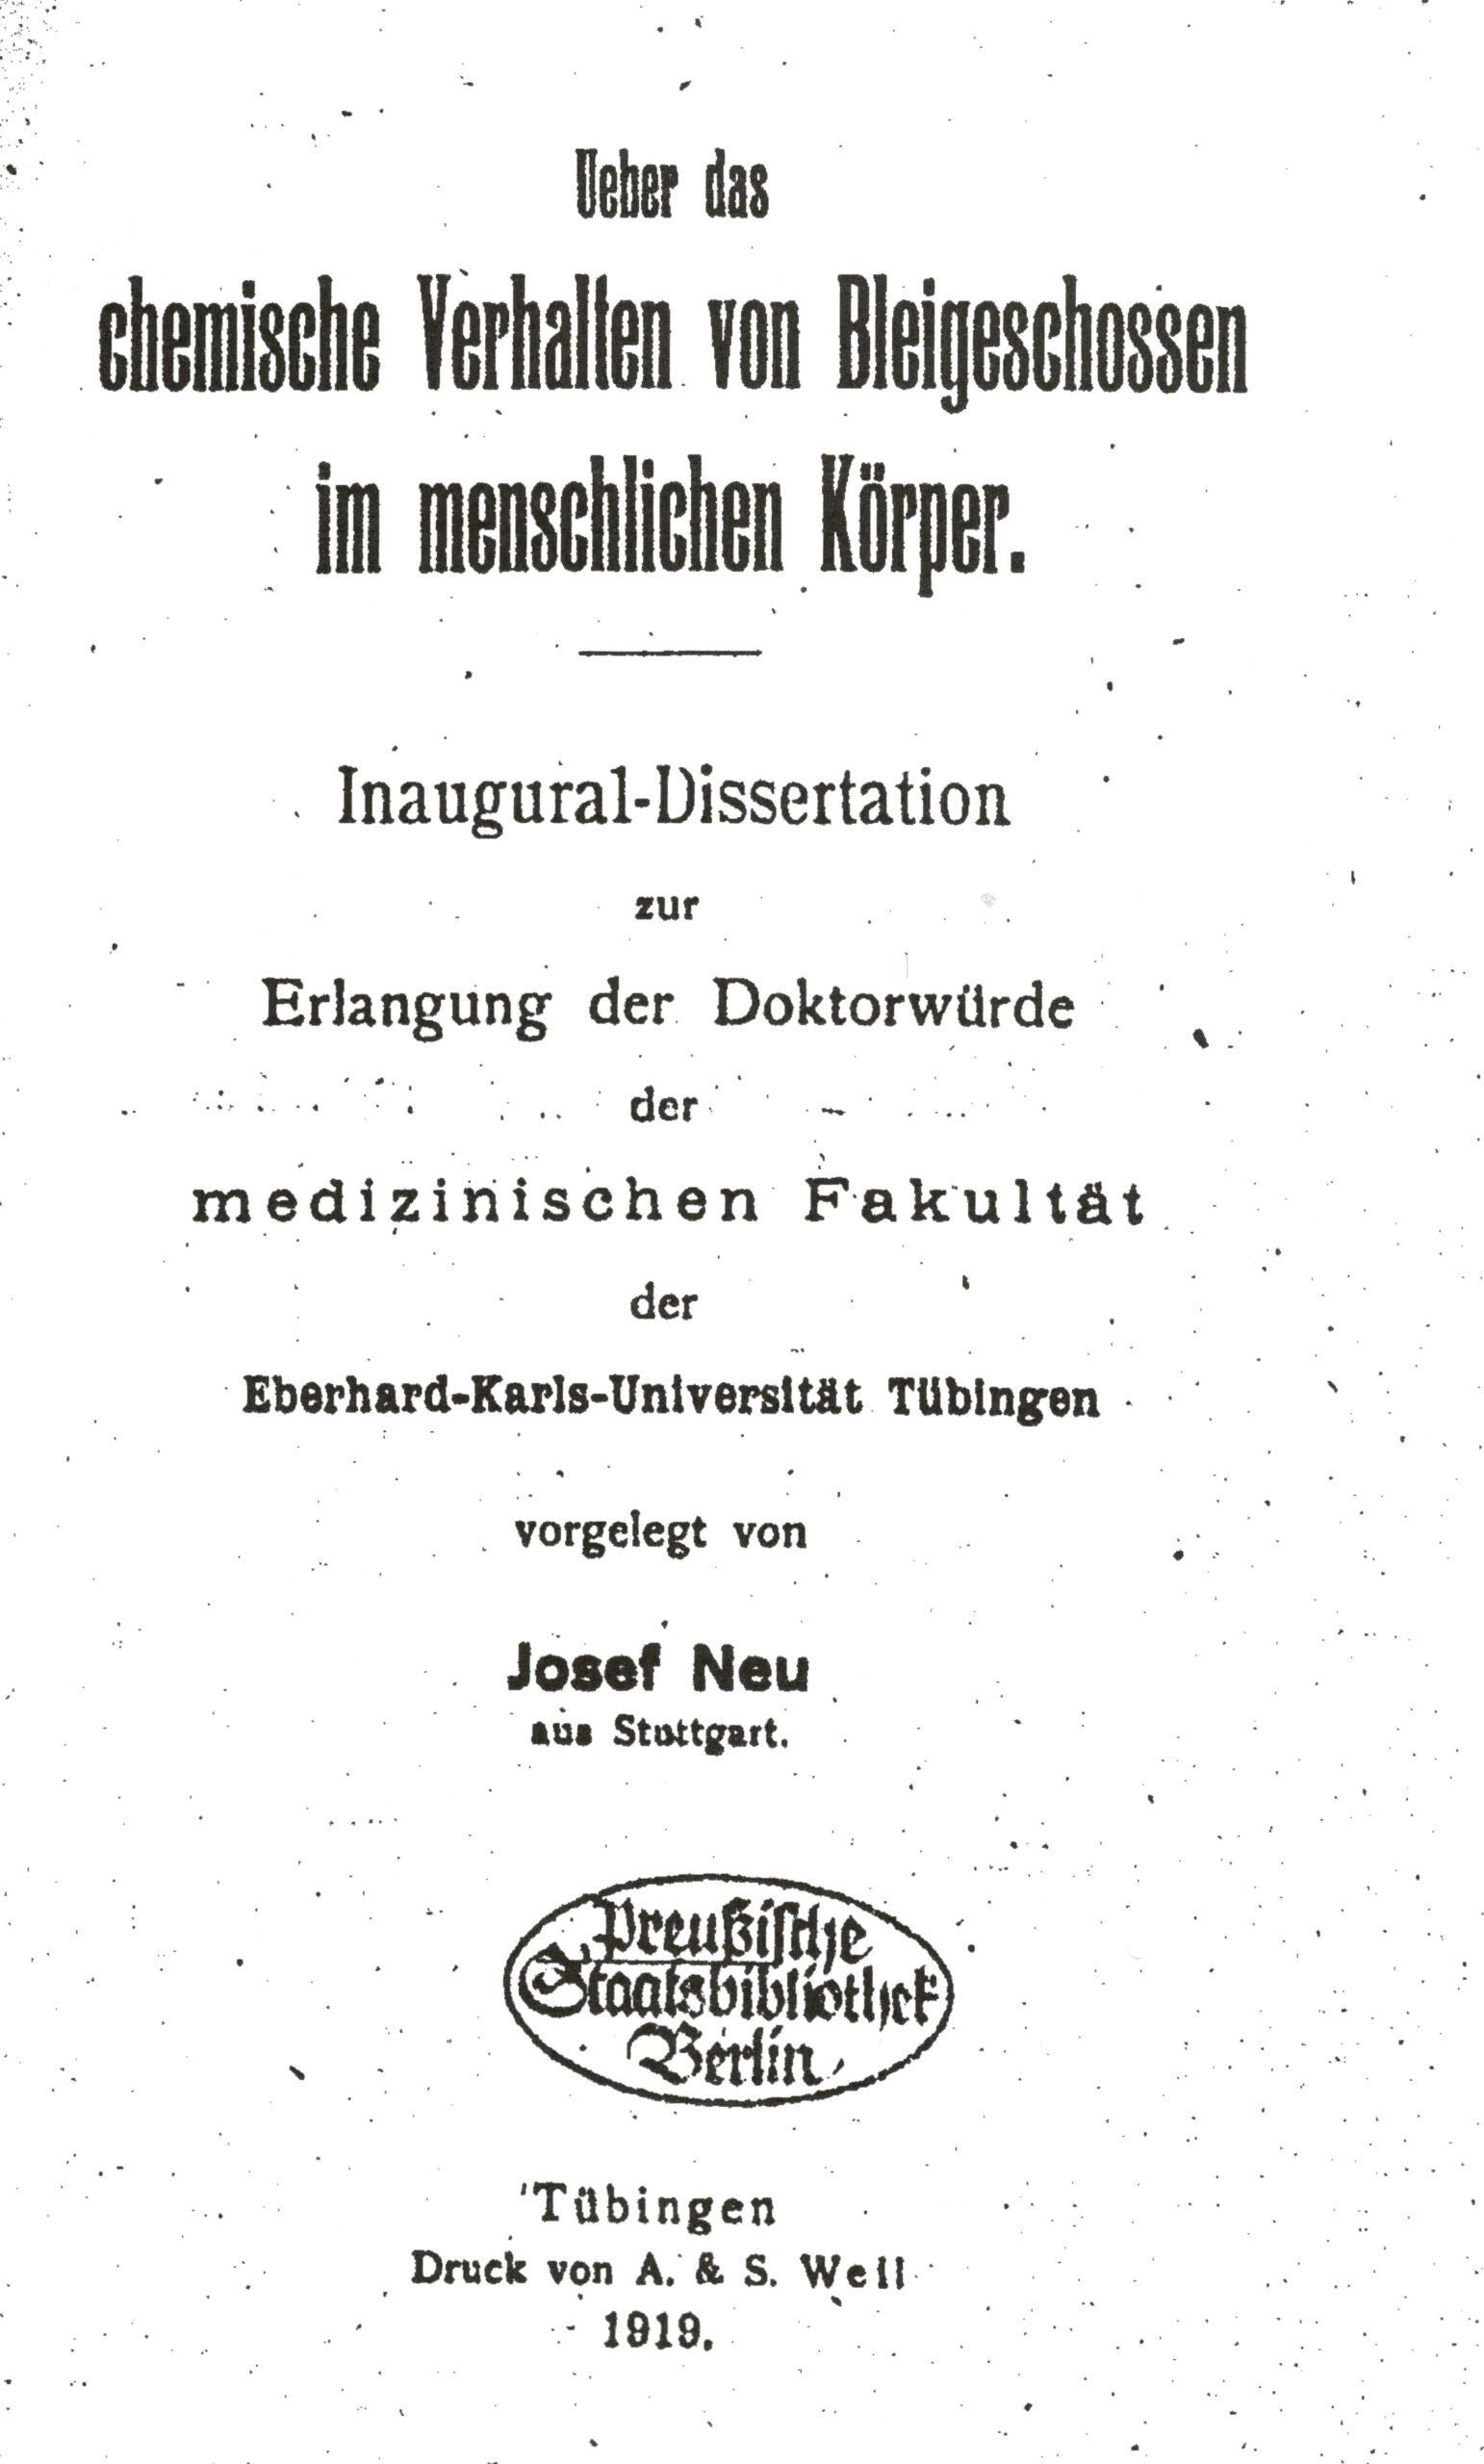 Dissertation, Tübingen 1919